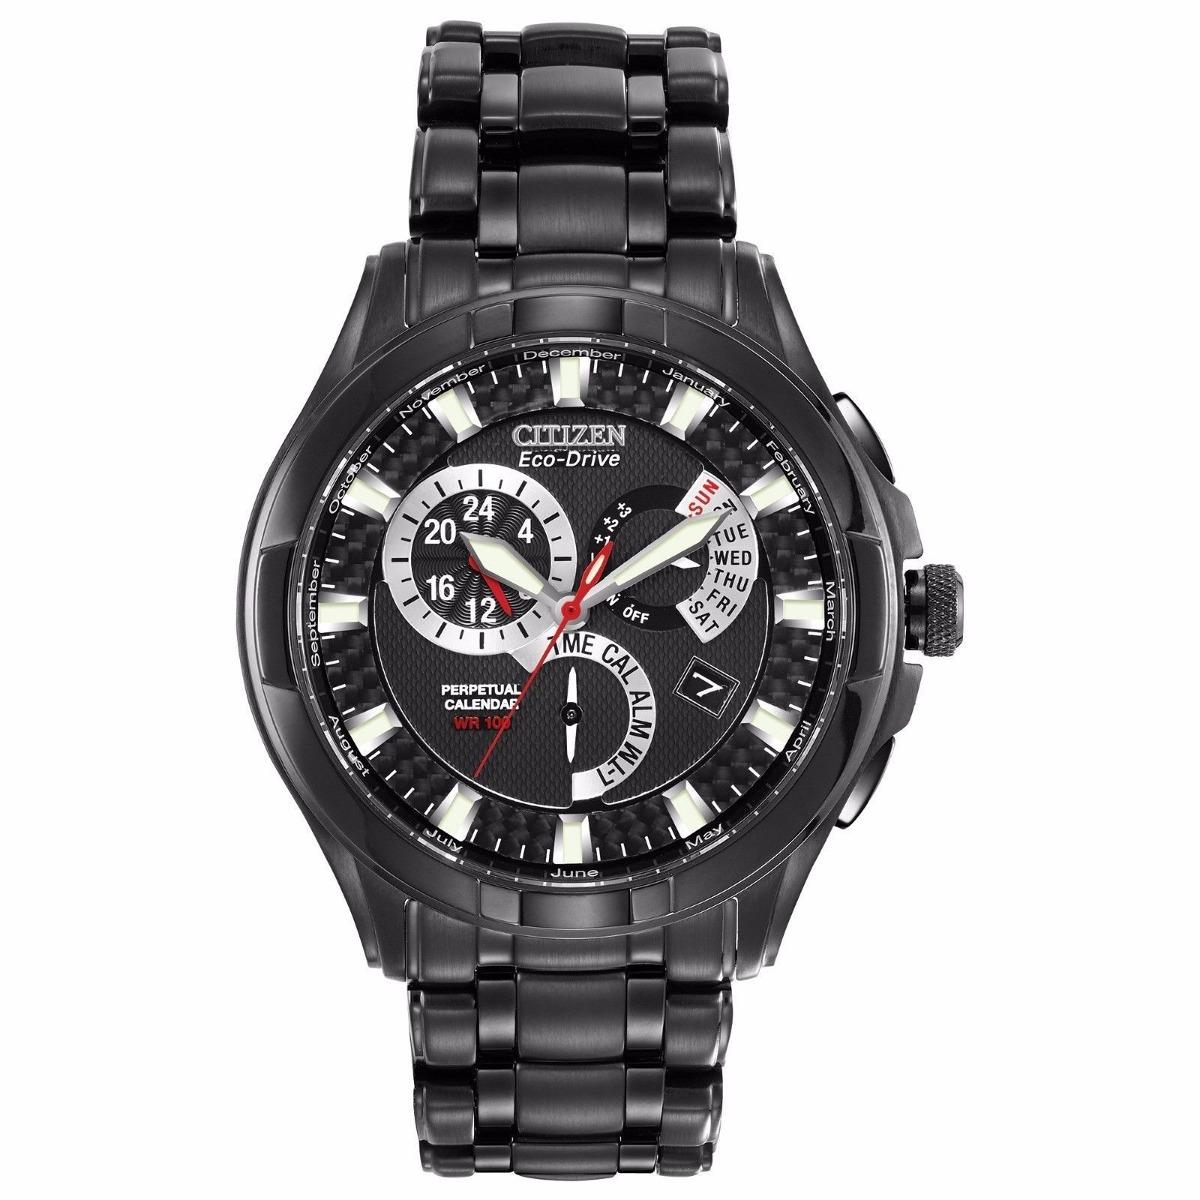 691d8be9490 Citizen Eco-drive Hombre Bl8097-52e Calibre Reloj... -   306.990 en ...